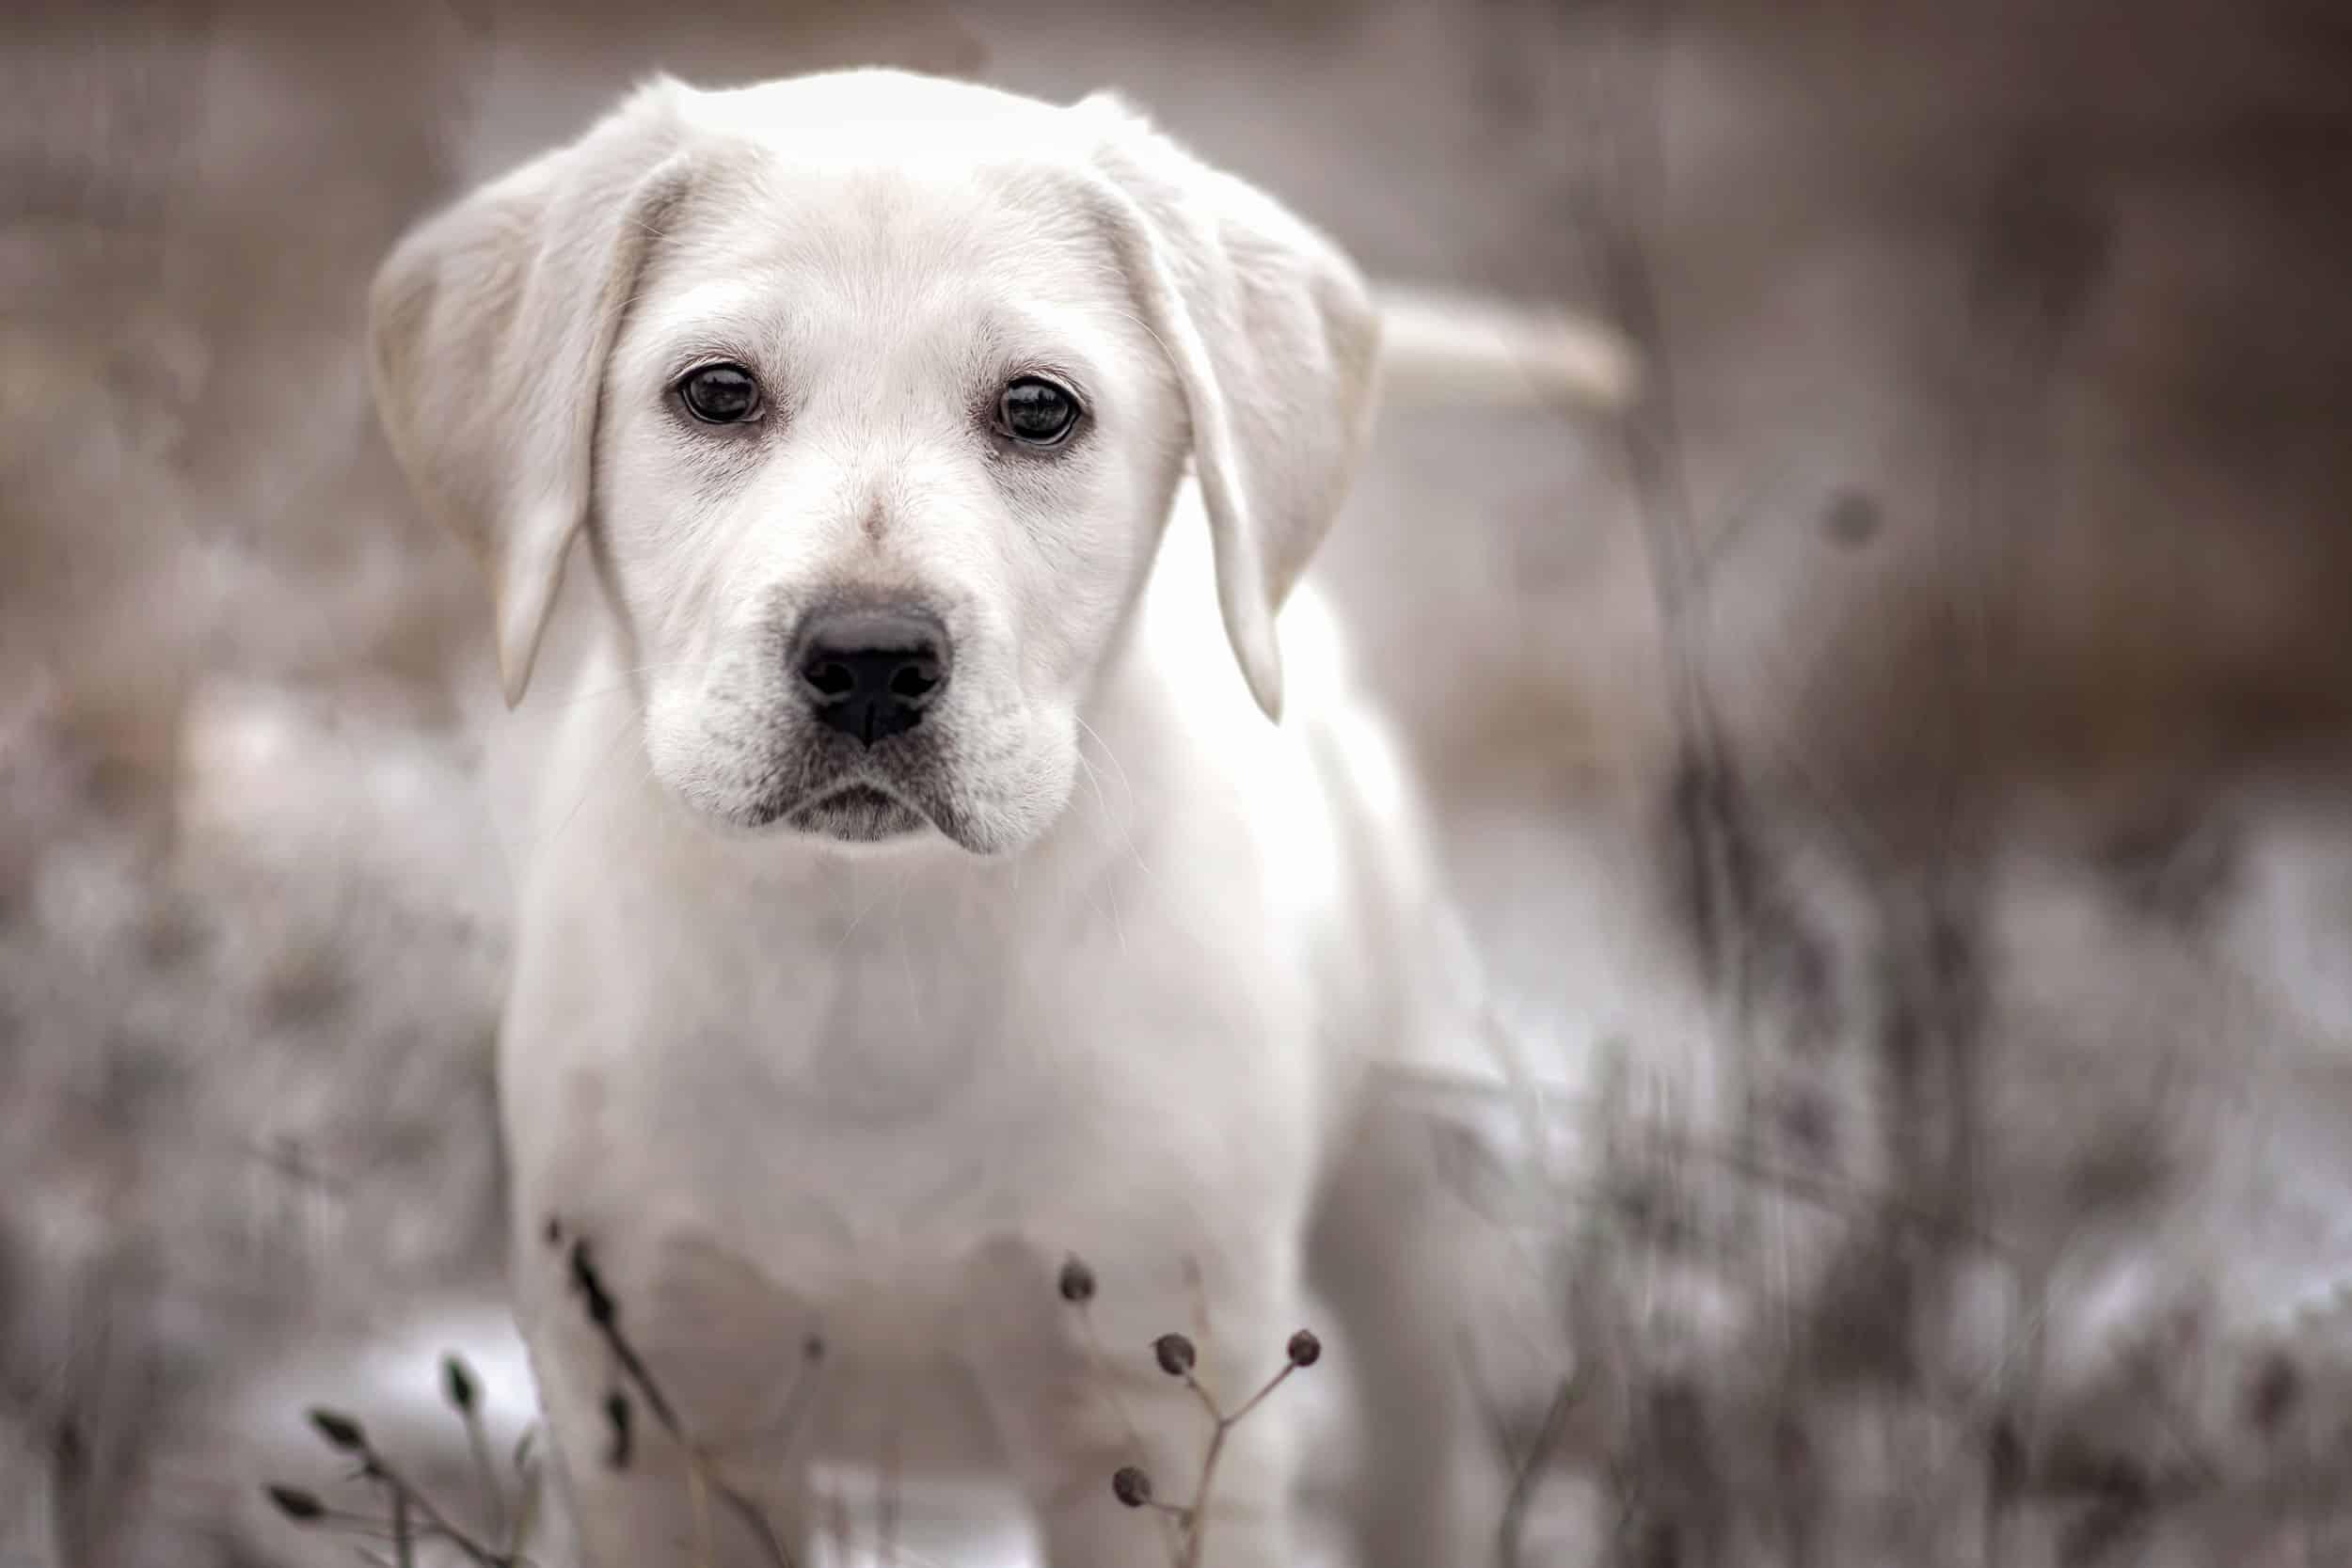 Twyla megaesophagus rescue dogs in Idaho